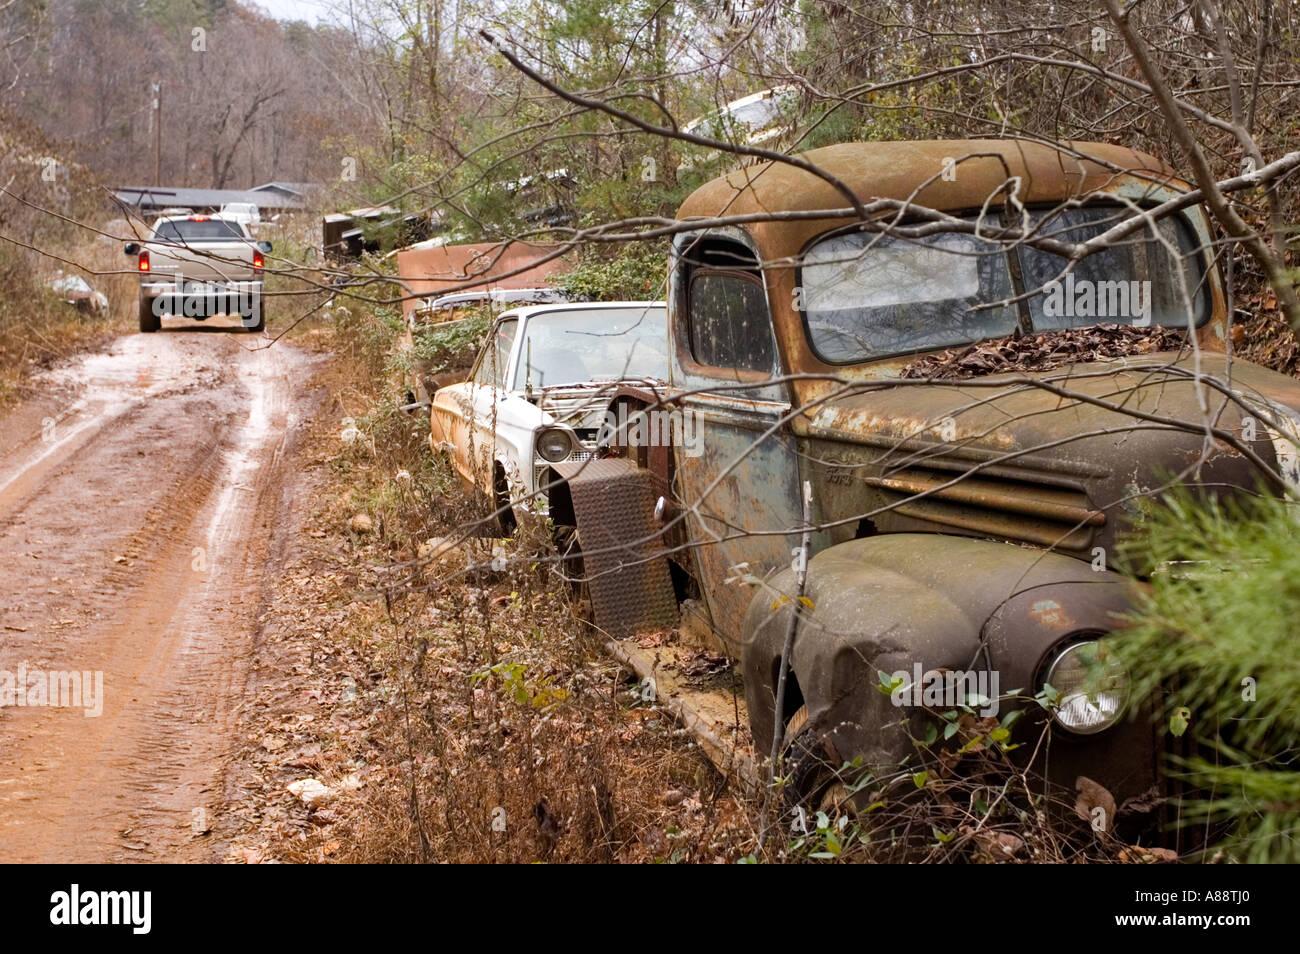 Sonnys Junk Yard, Blaine, Tennessee Stock Photo: 6871583 - Alamy